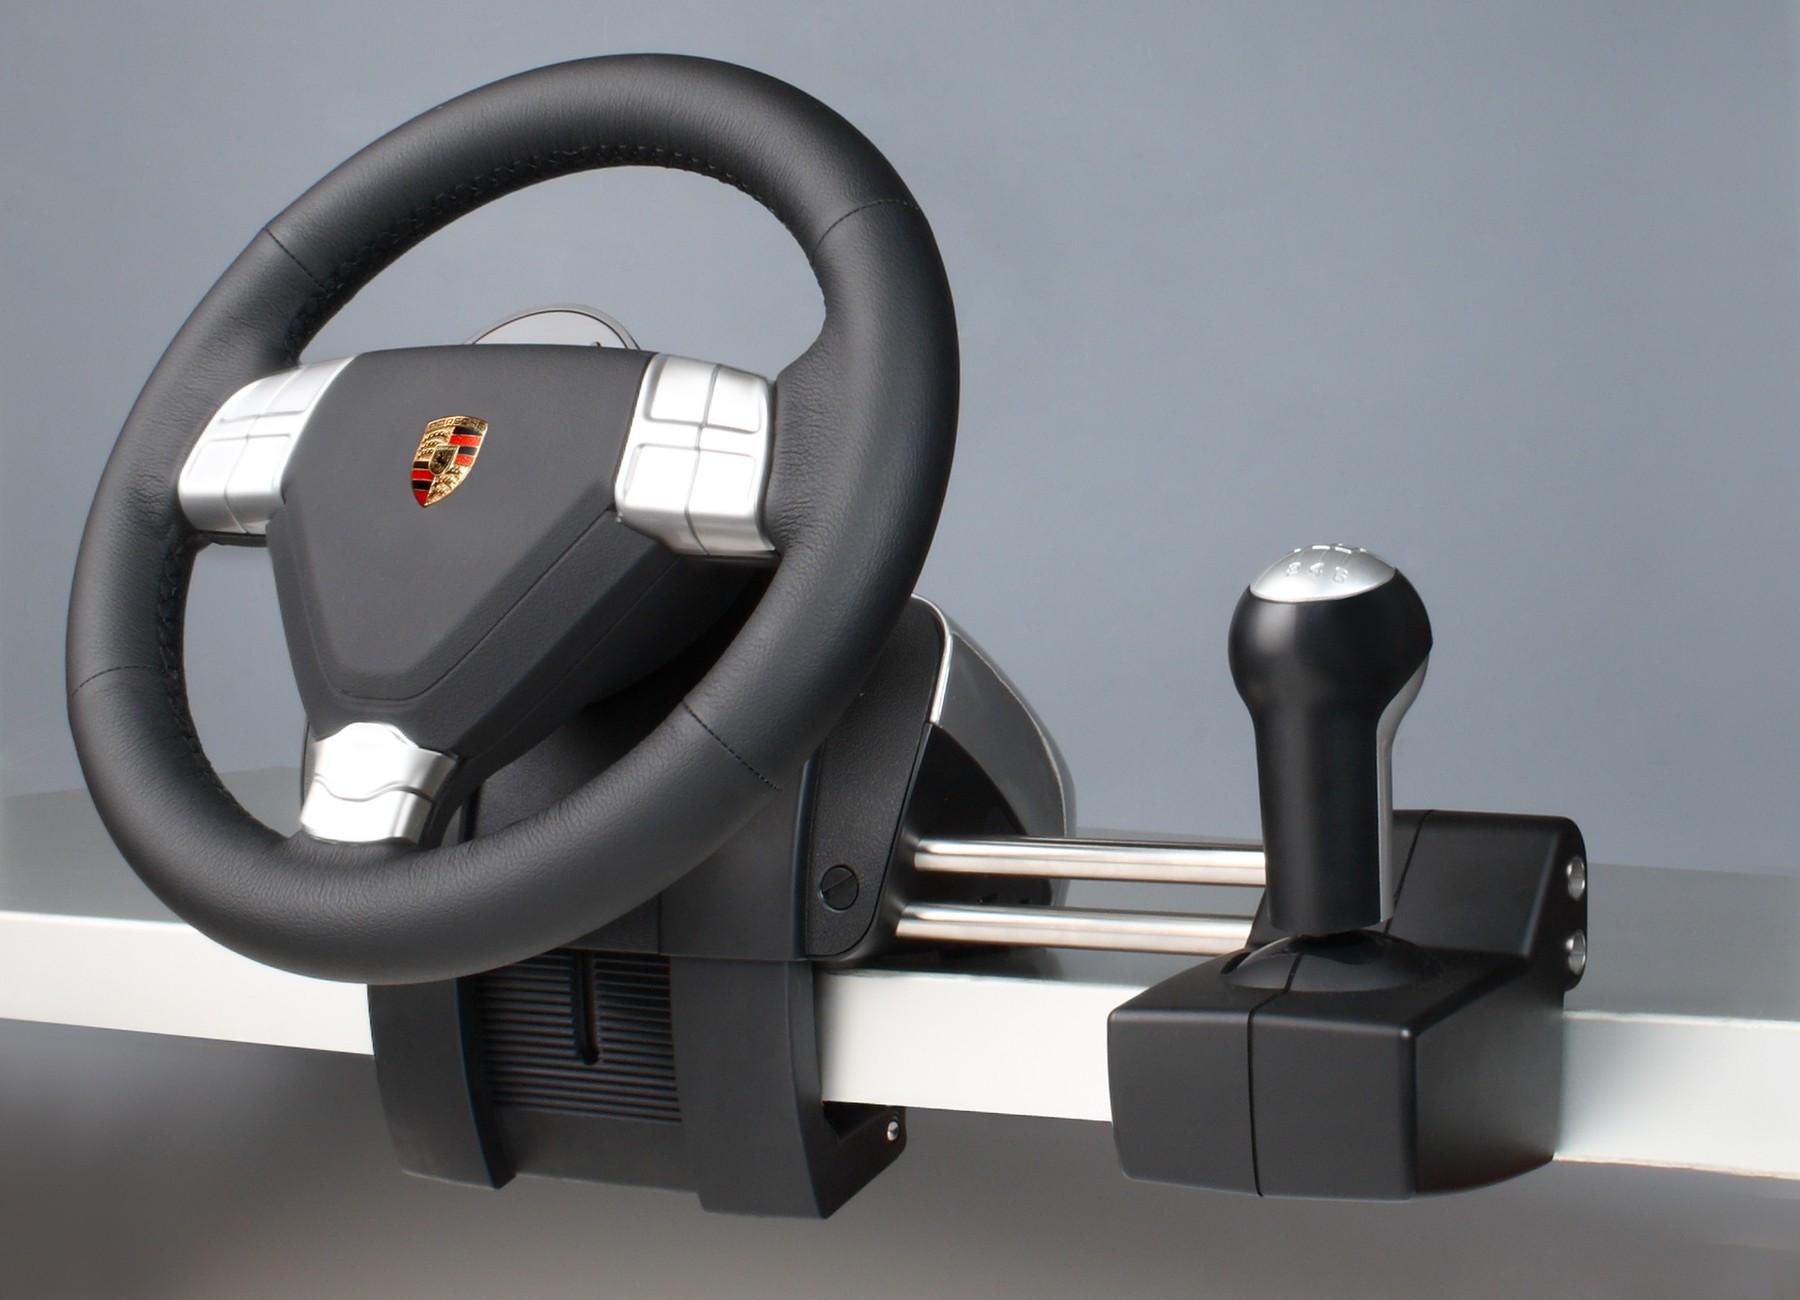 Porsche 911 Turbo >> Test Fanatec Porsche 911 Turbo S